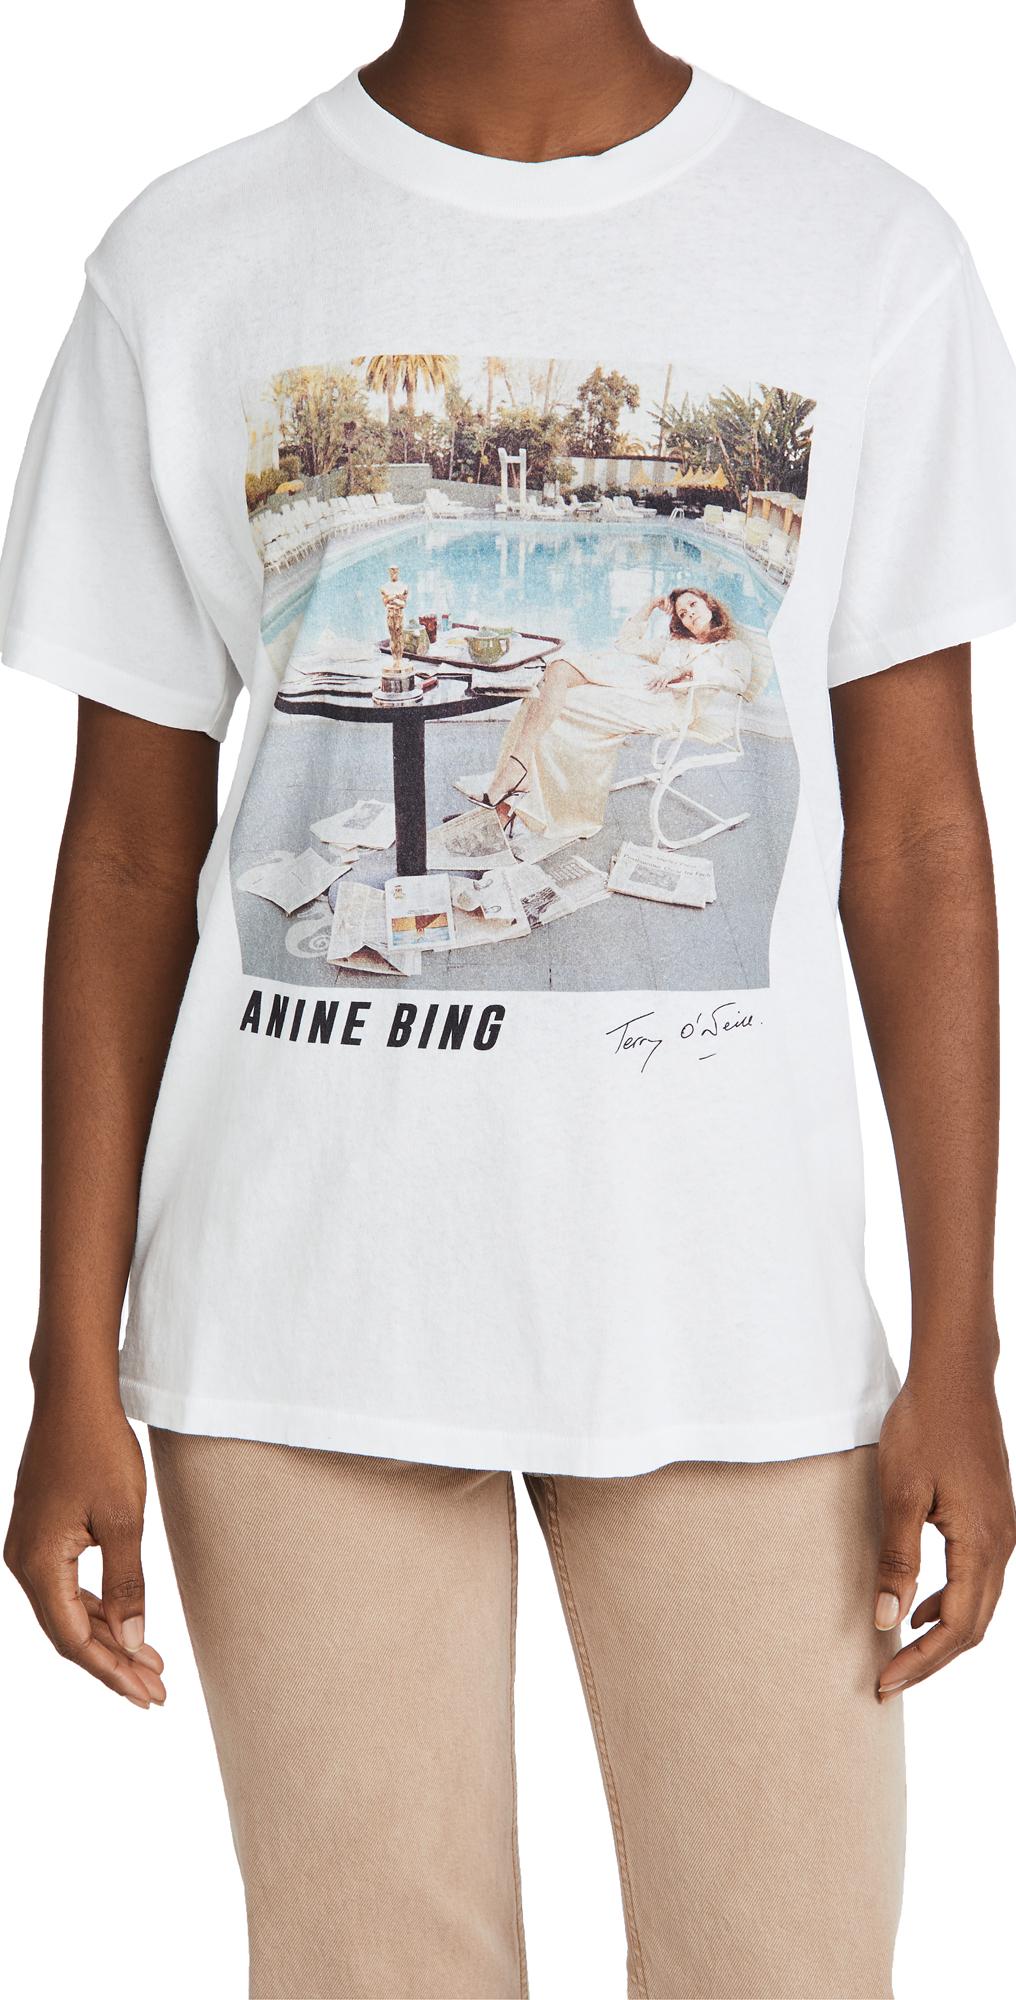 ANINE BING Lili Tee AB x TO F